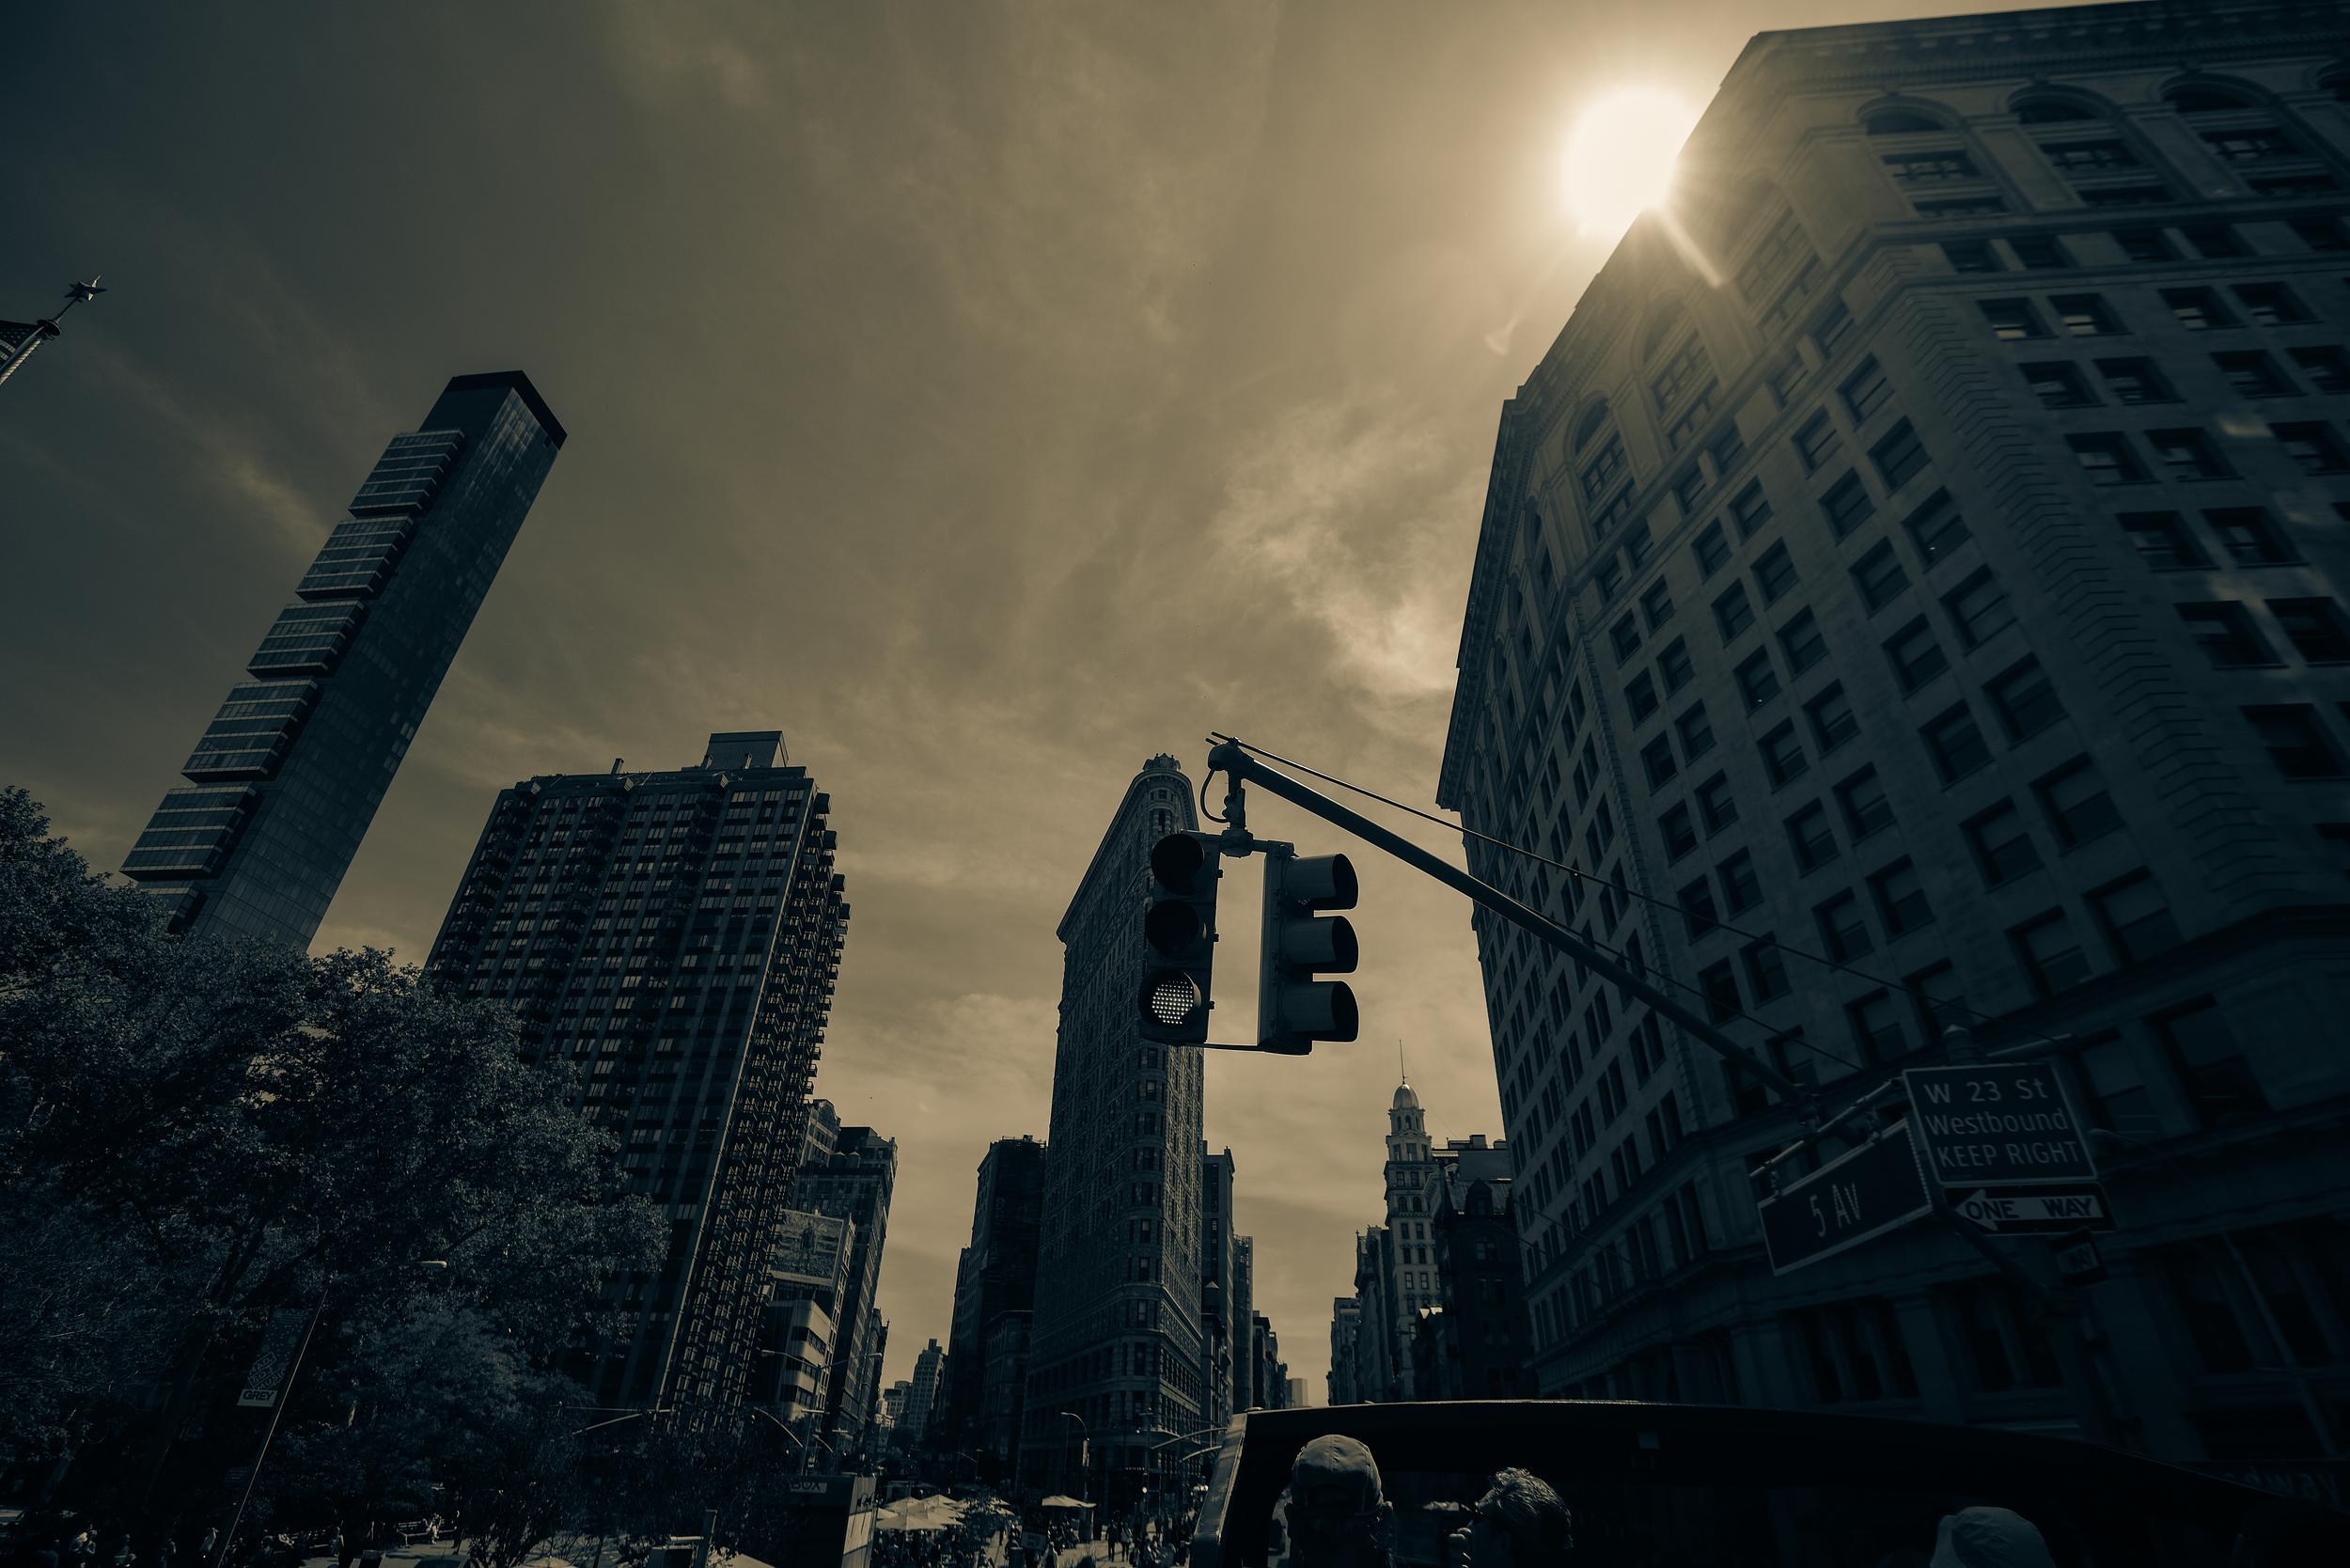 New_York_2015_06_08-69.jpg